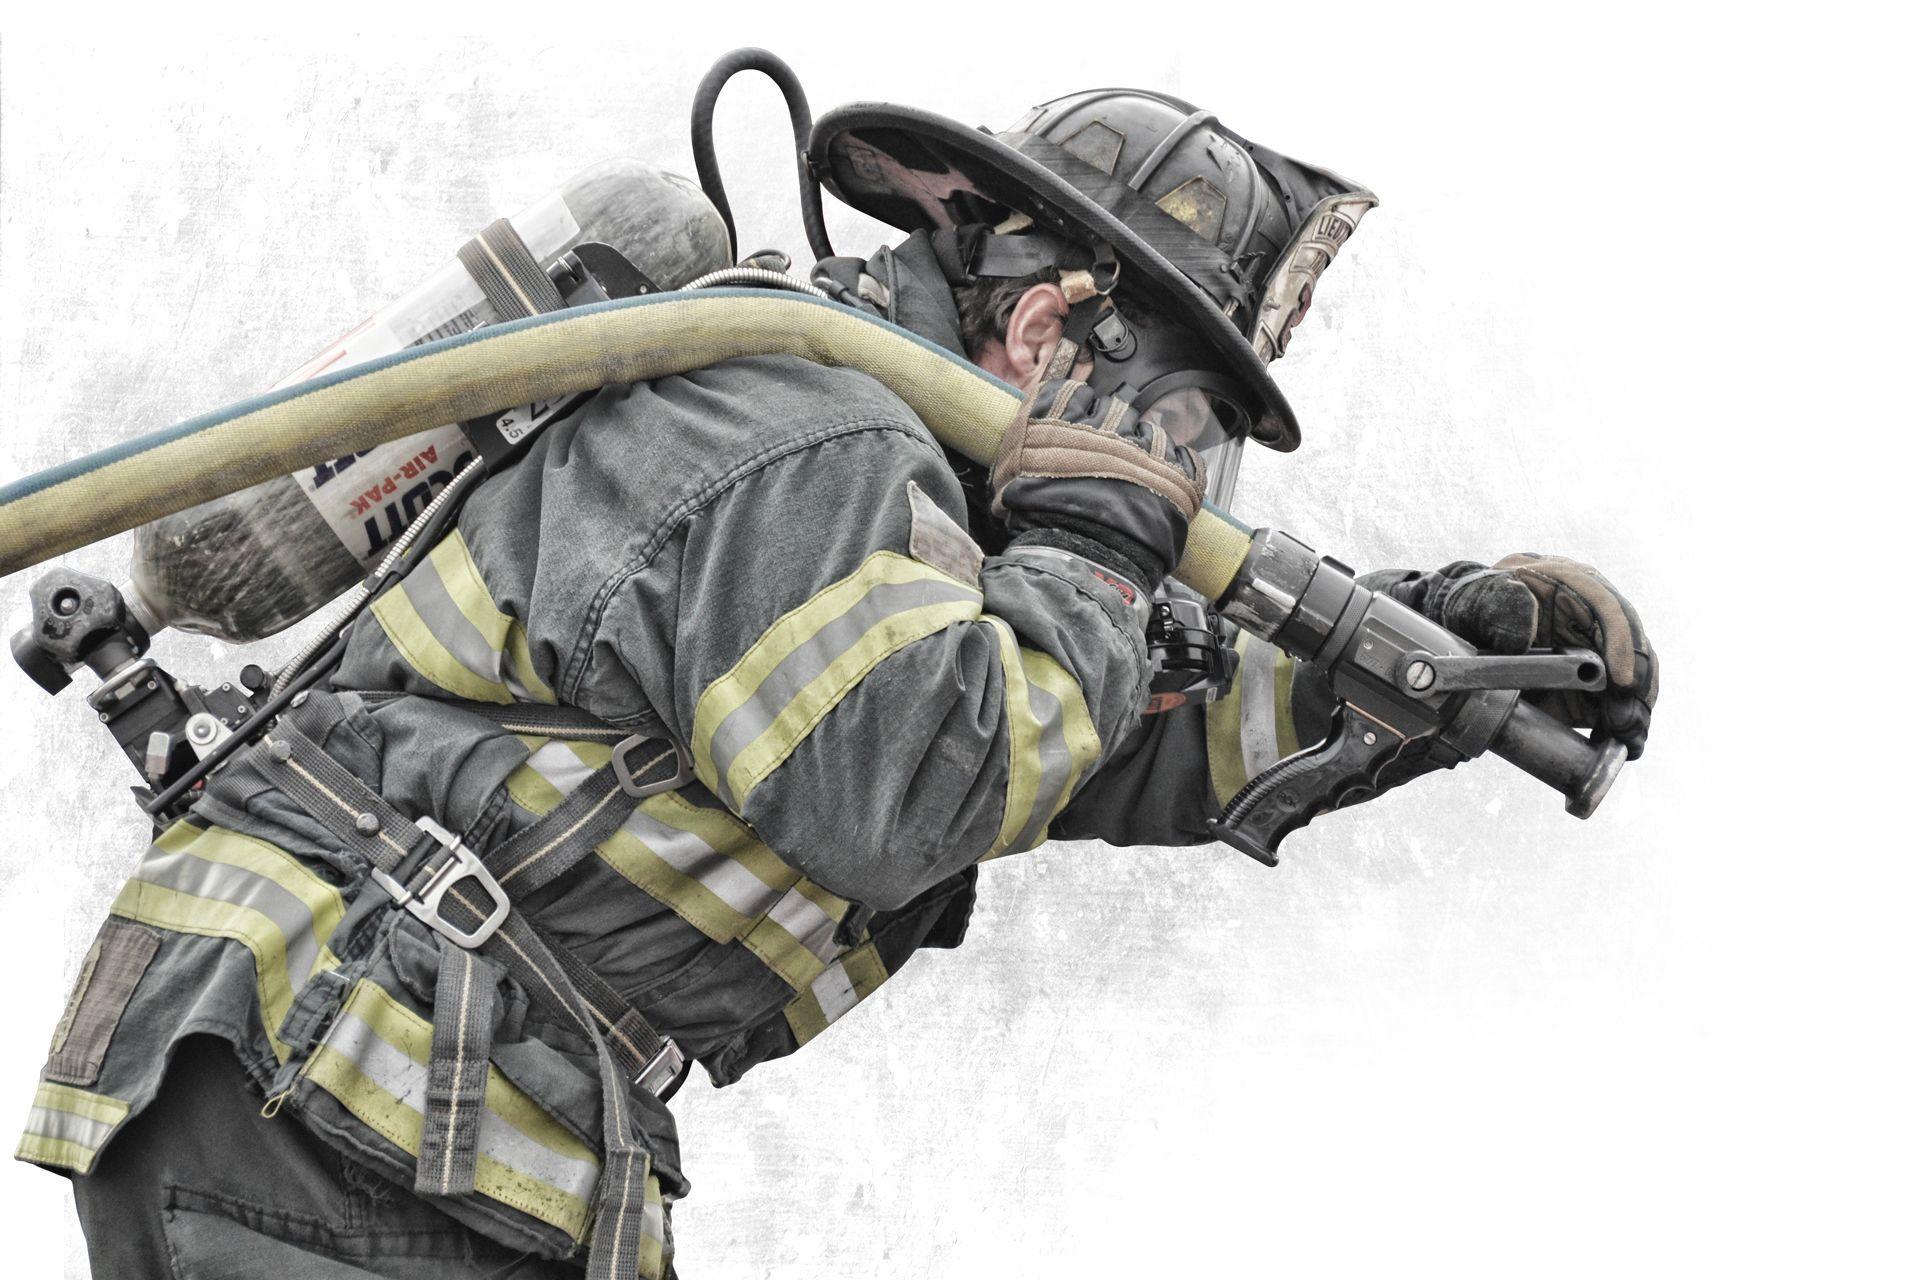 Free Firefighter Wallpaper For Phone 19201280 Firefighting